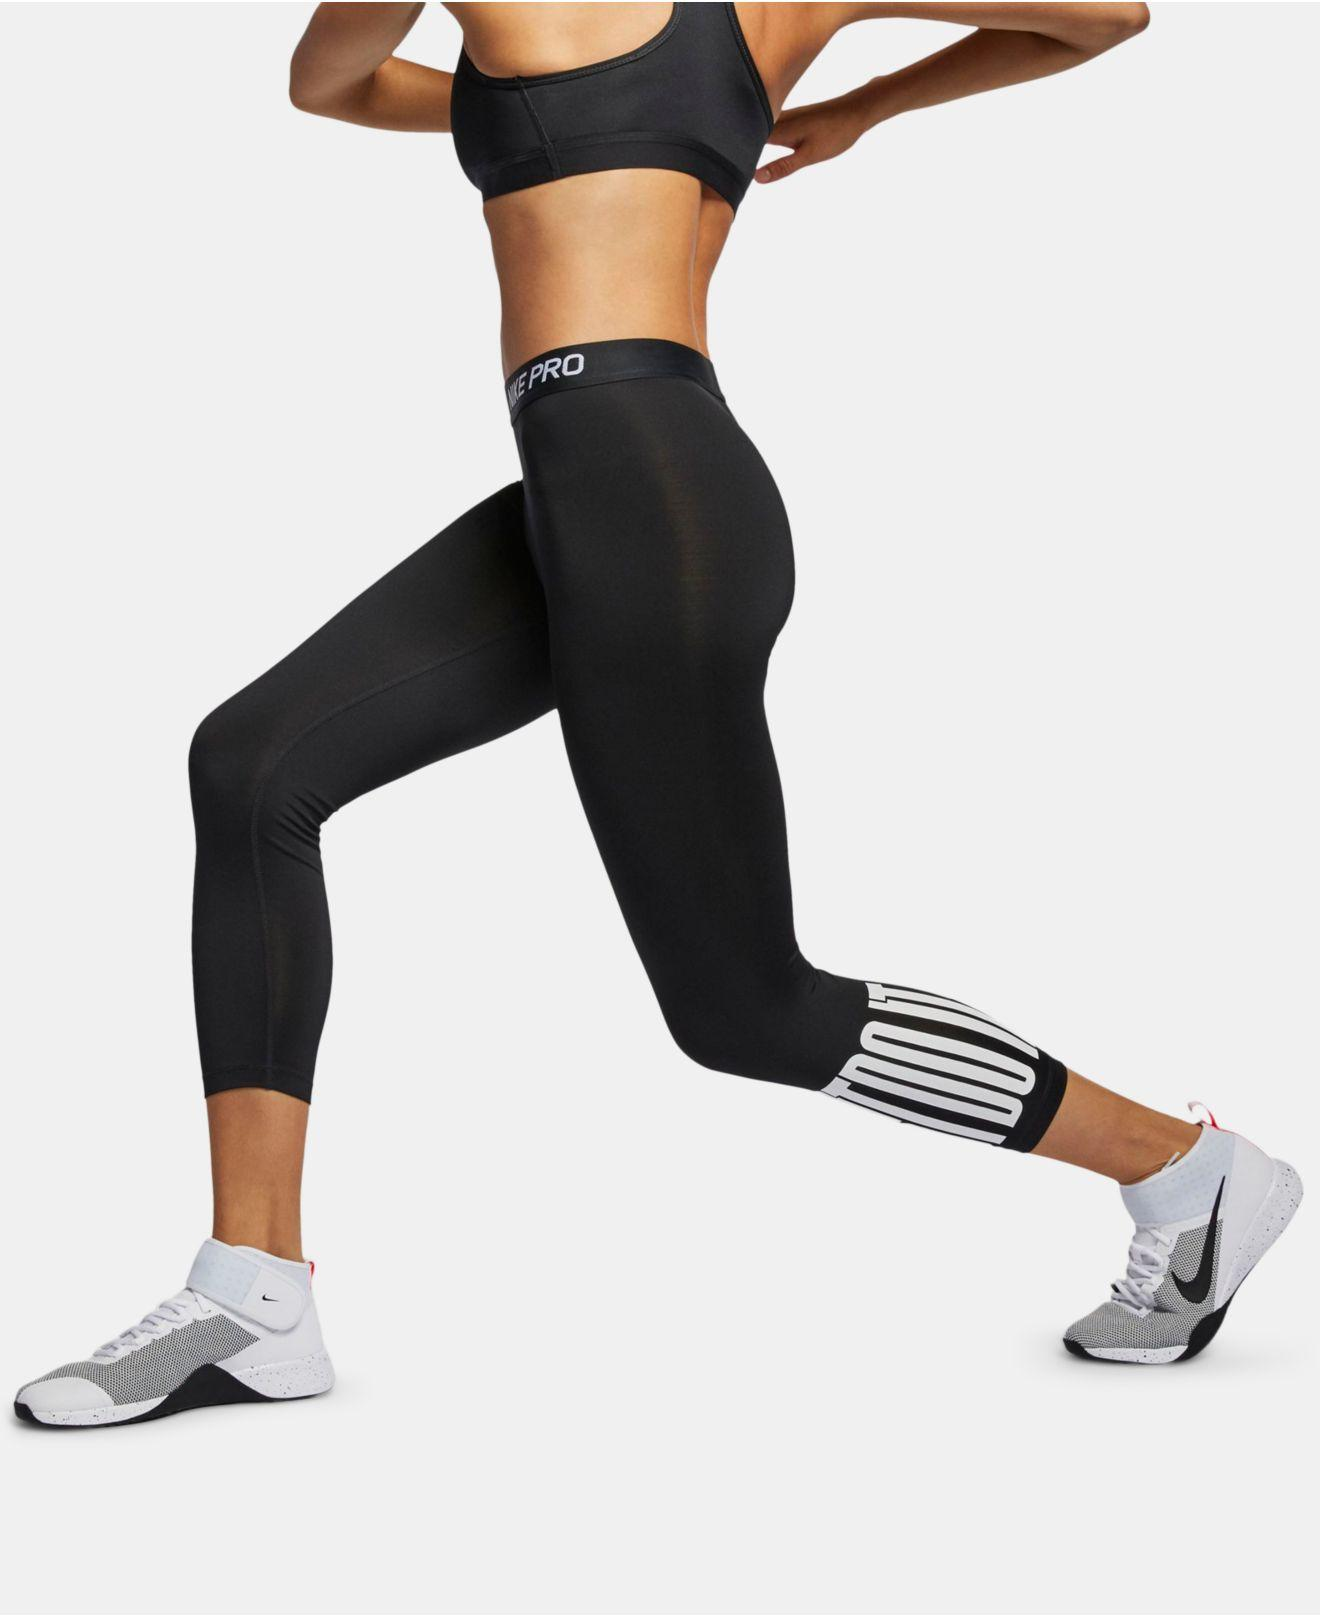 81a082777c5bd Nike Pro Just Do It Cropped Leggings in Black - Lyst